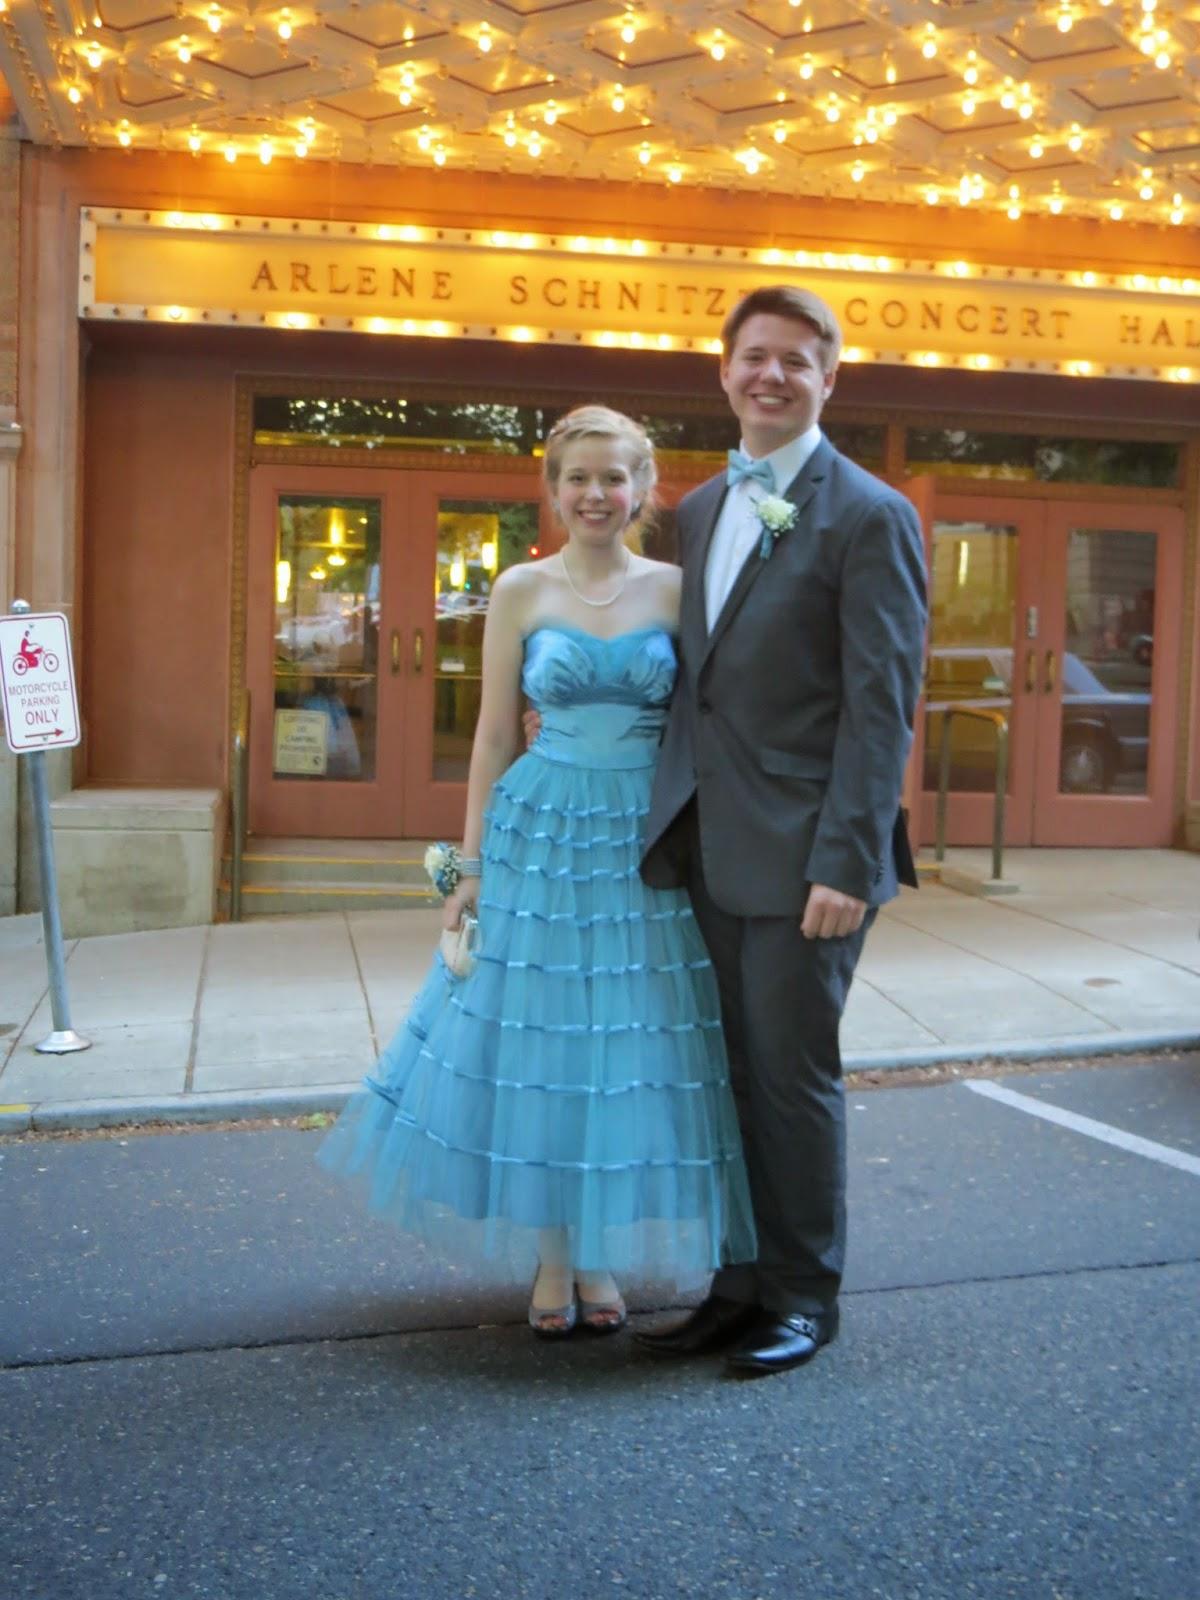 Xtabay Vintage Clothing Boutique - Portland, Oregon: Prom Season ...